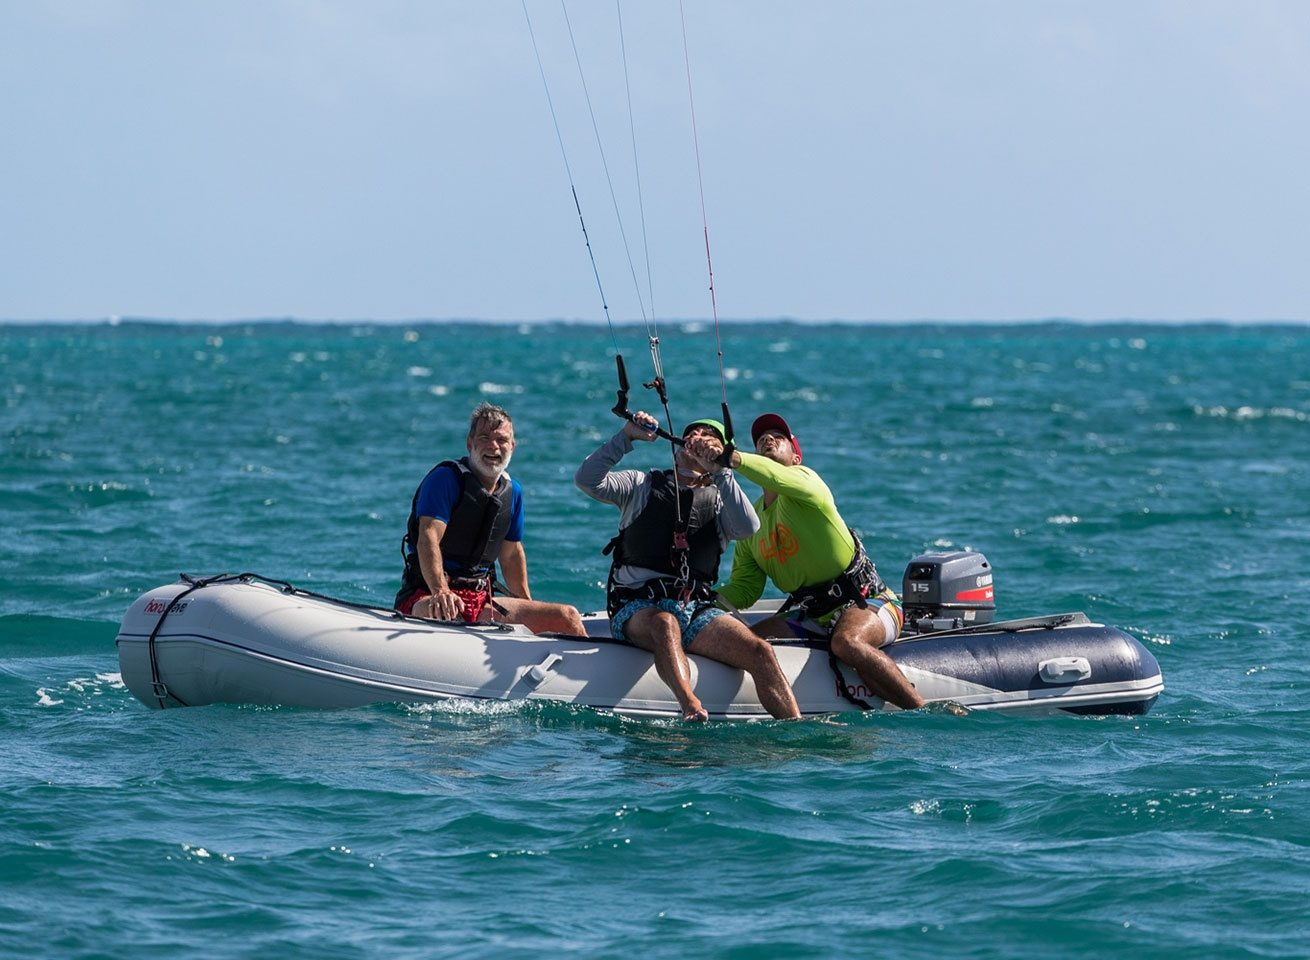 kitesurf lesson at green island for beginners